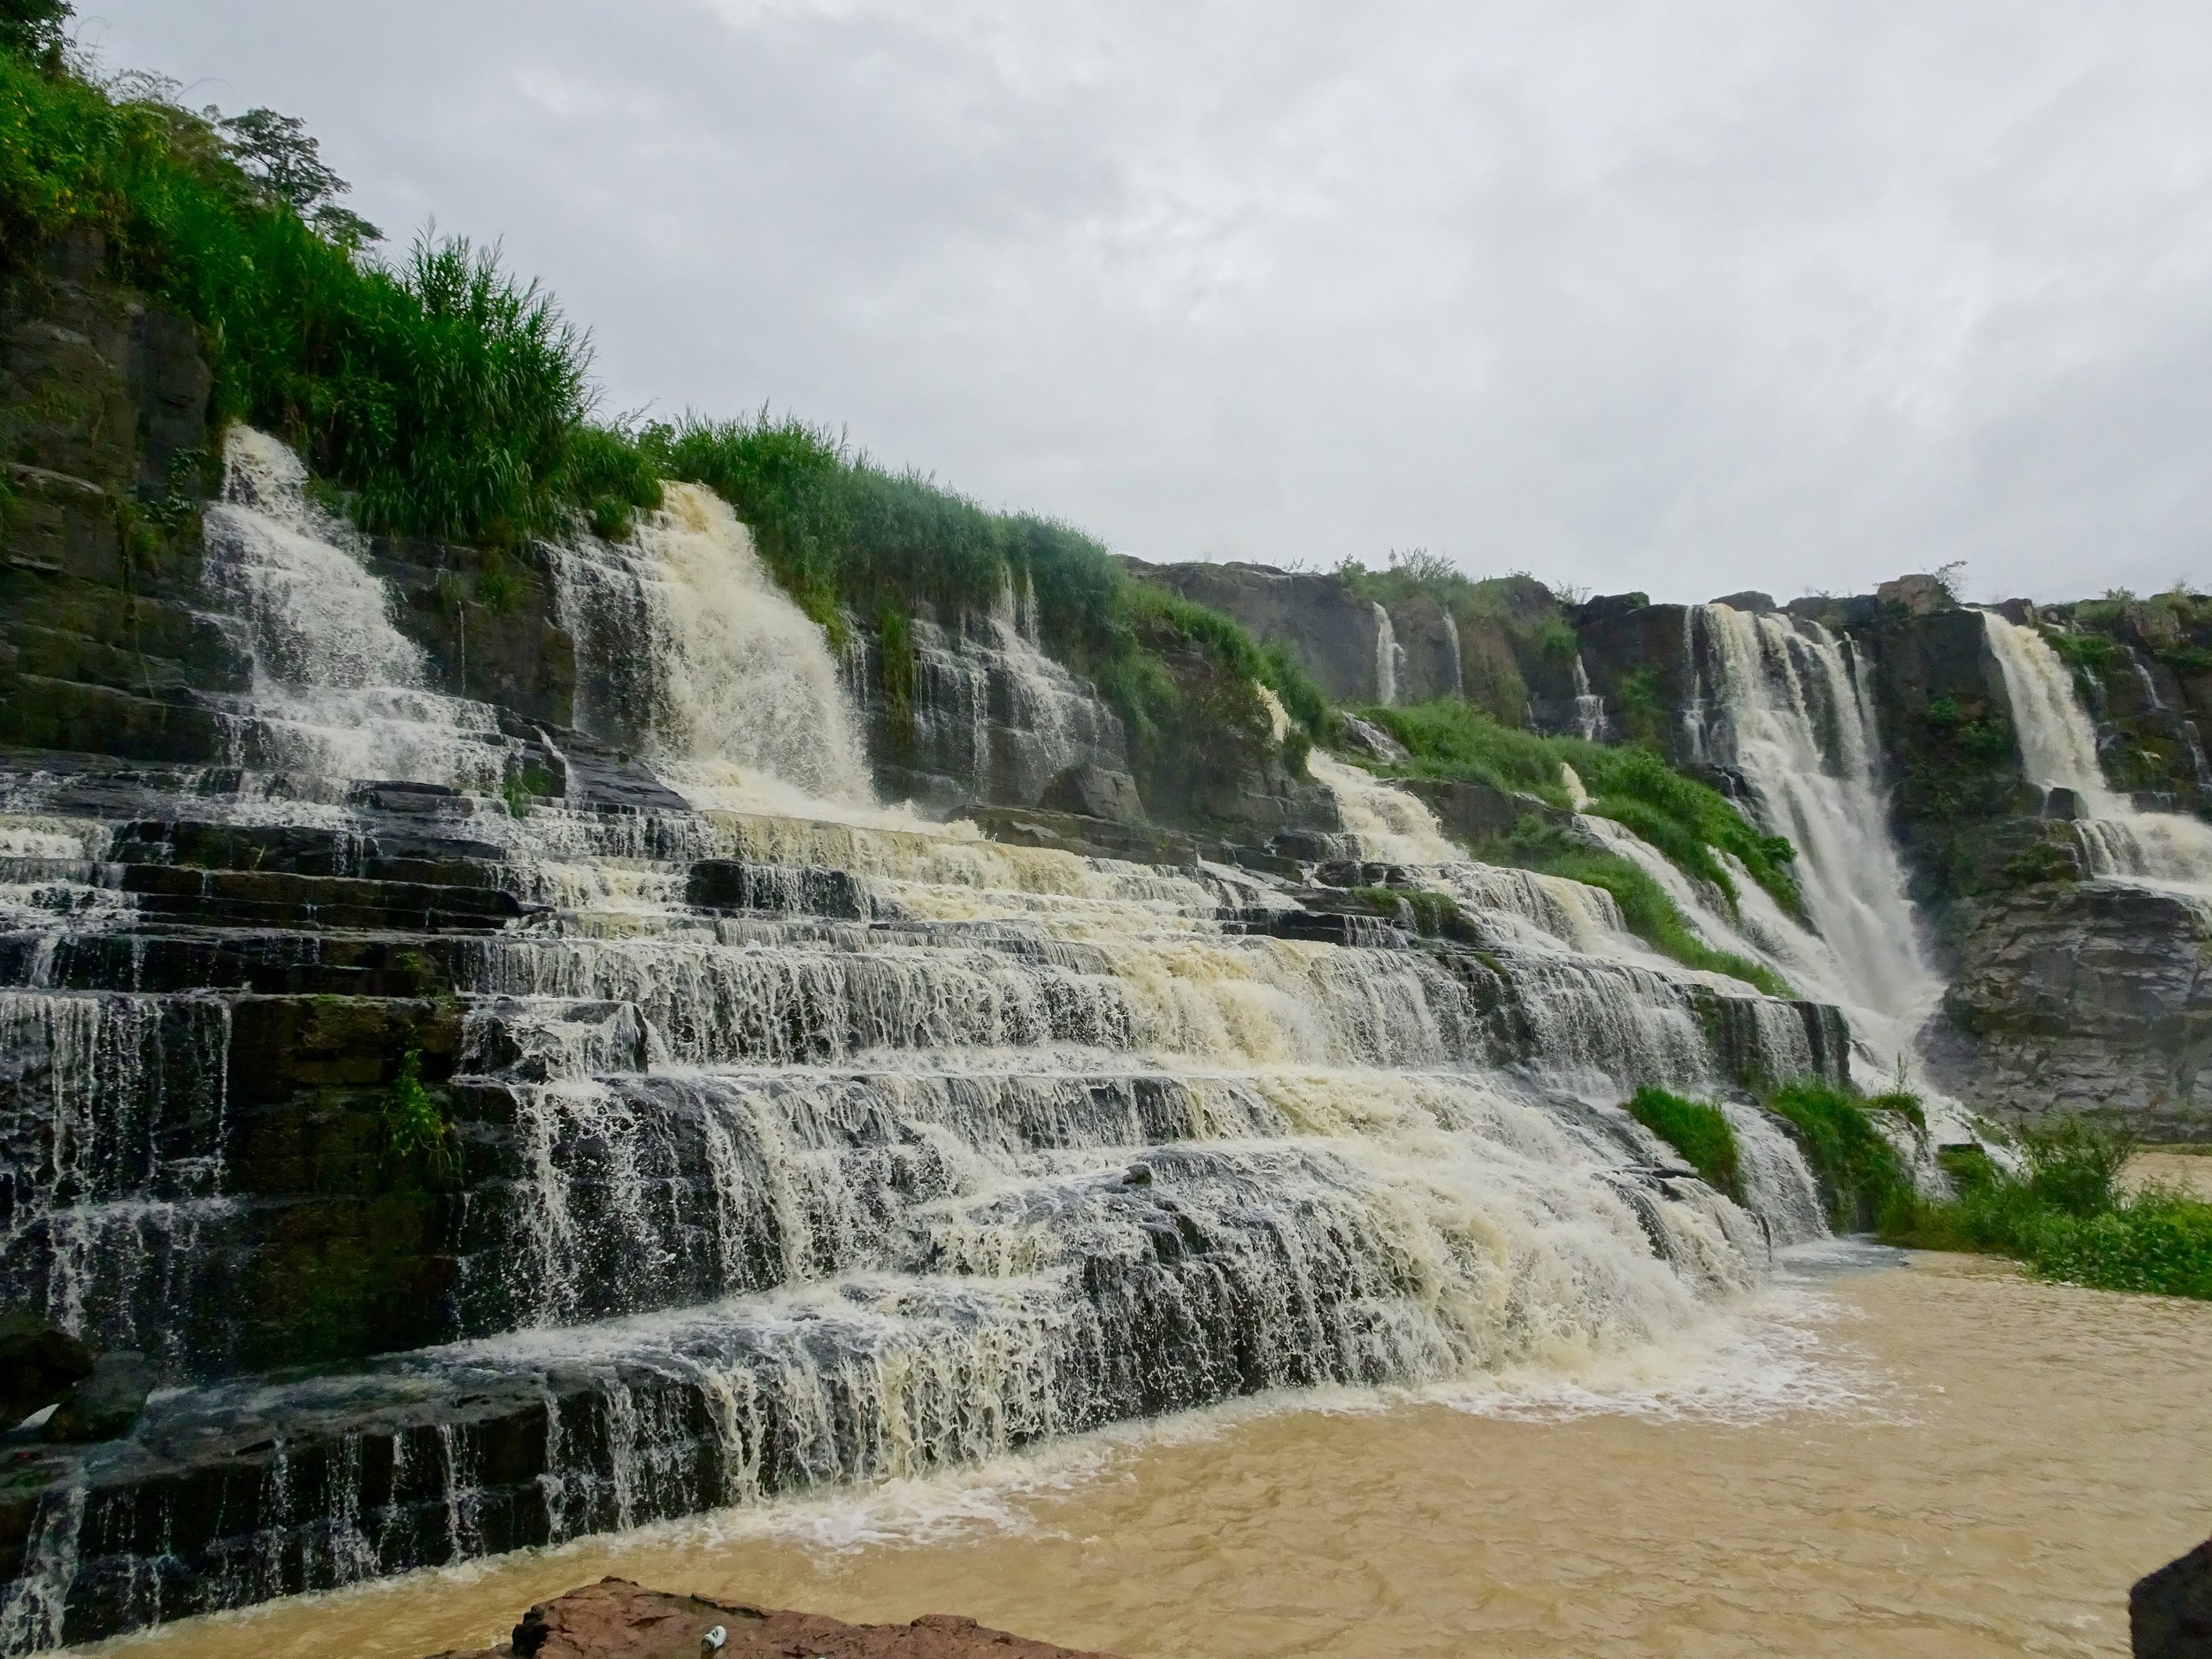 pongour falls, vietnam - m.quigley